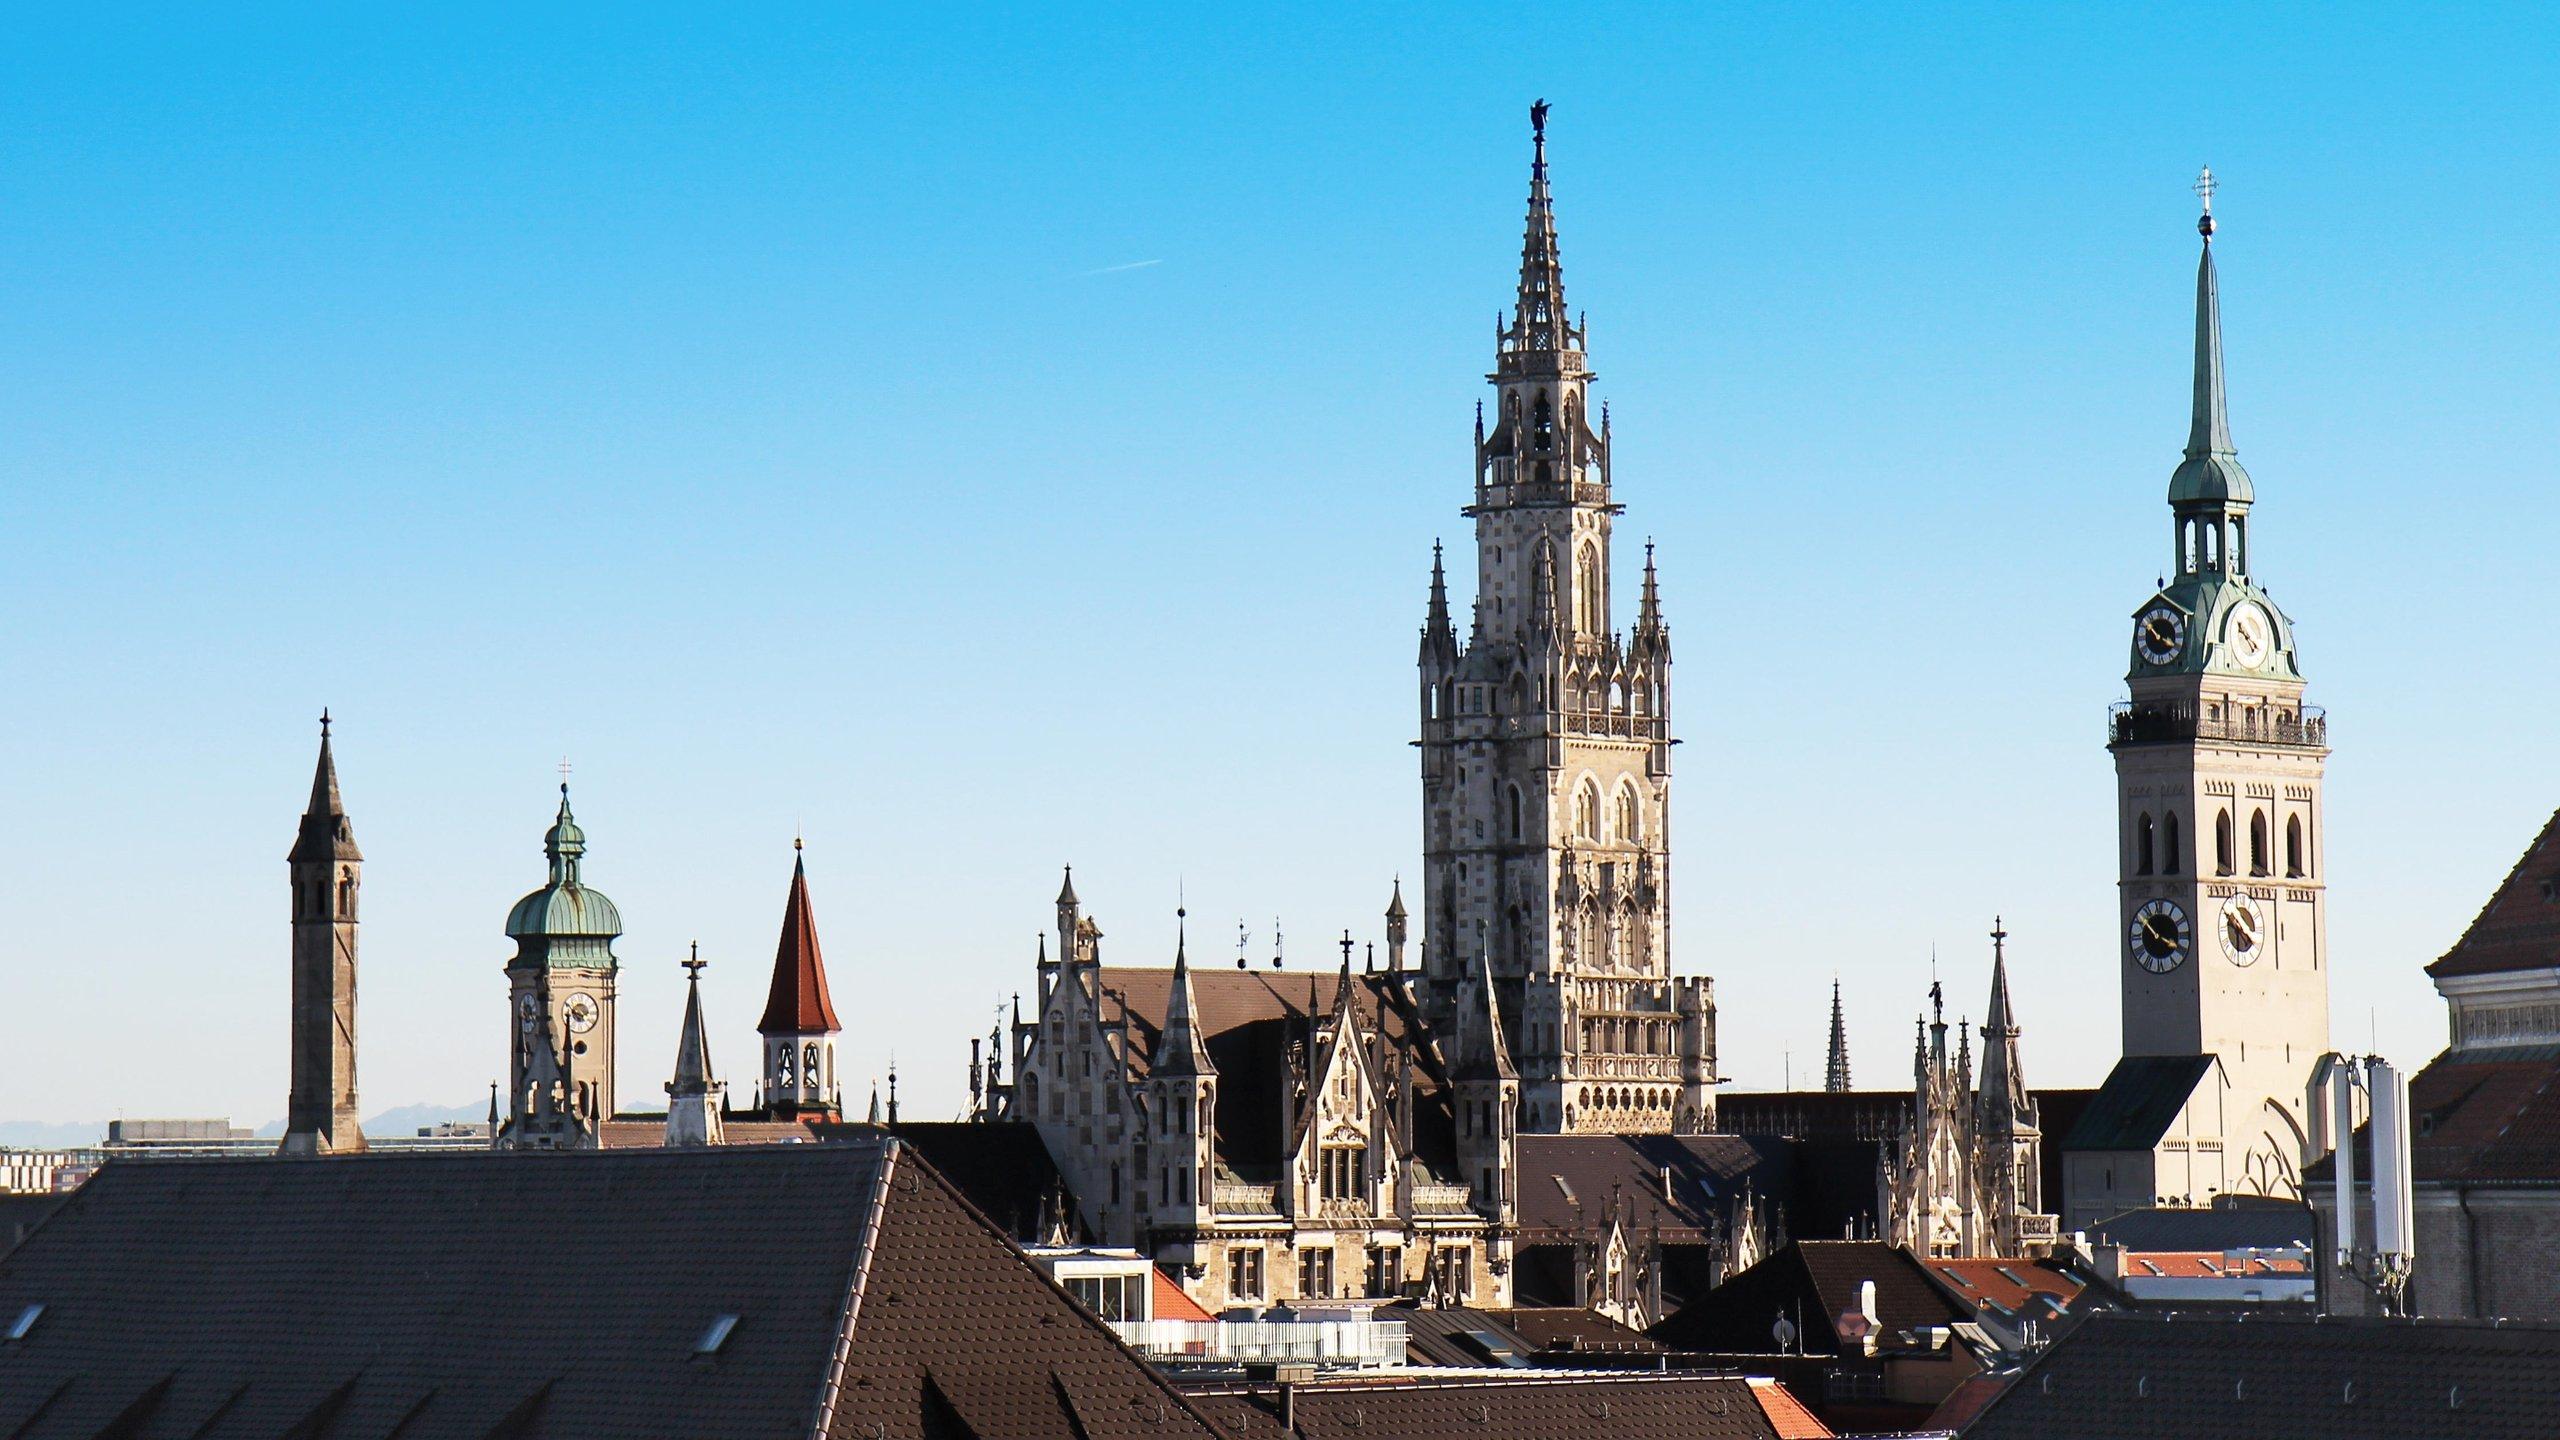 Town Hall of Marienplatz, Munich, Bavaria, Germany